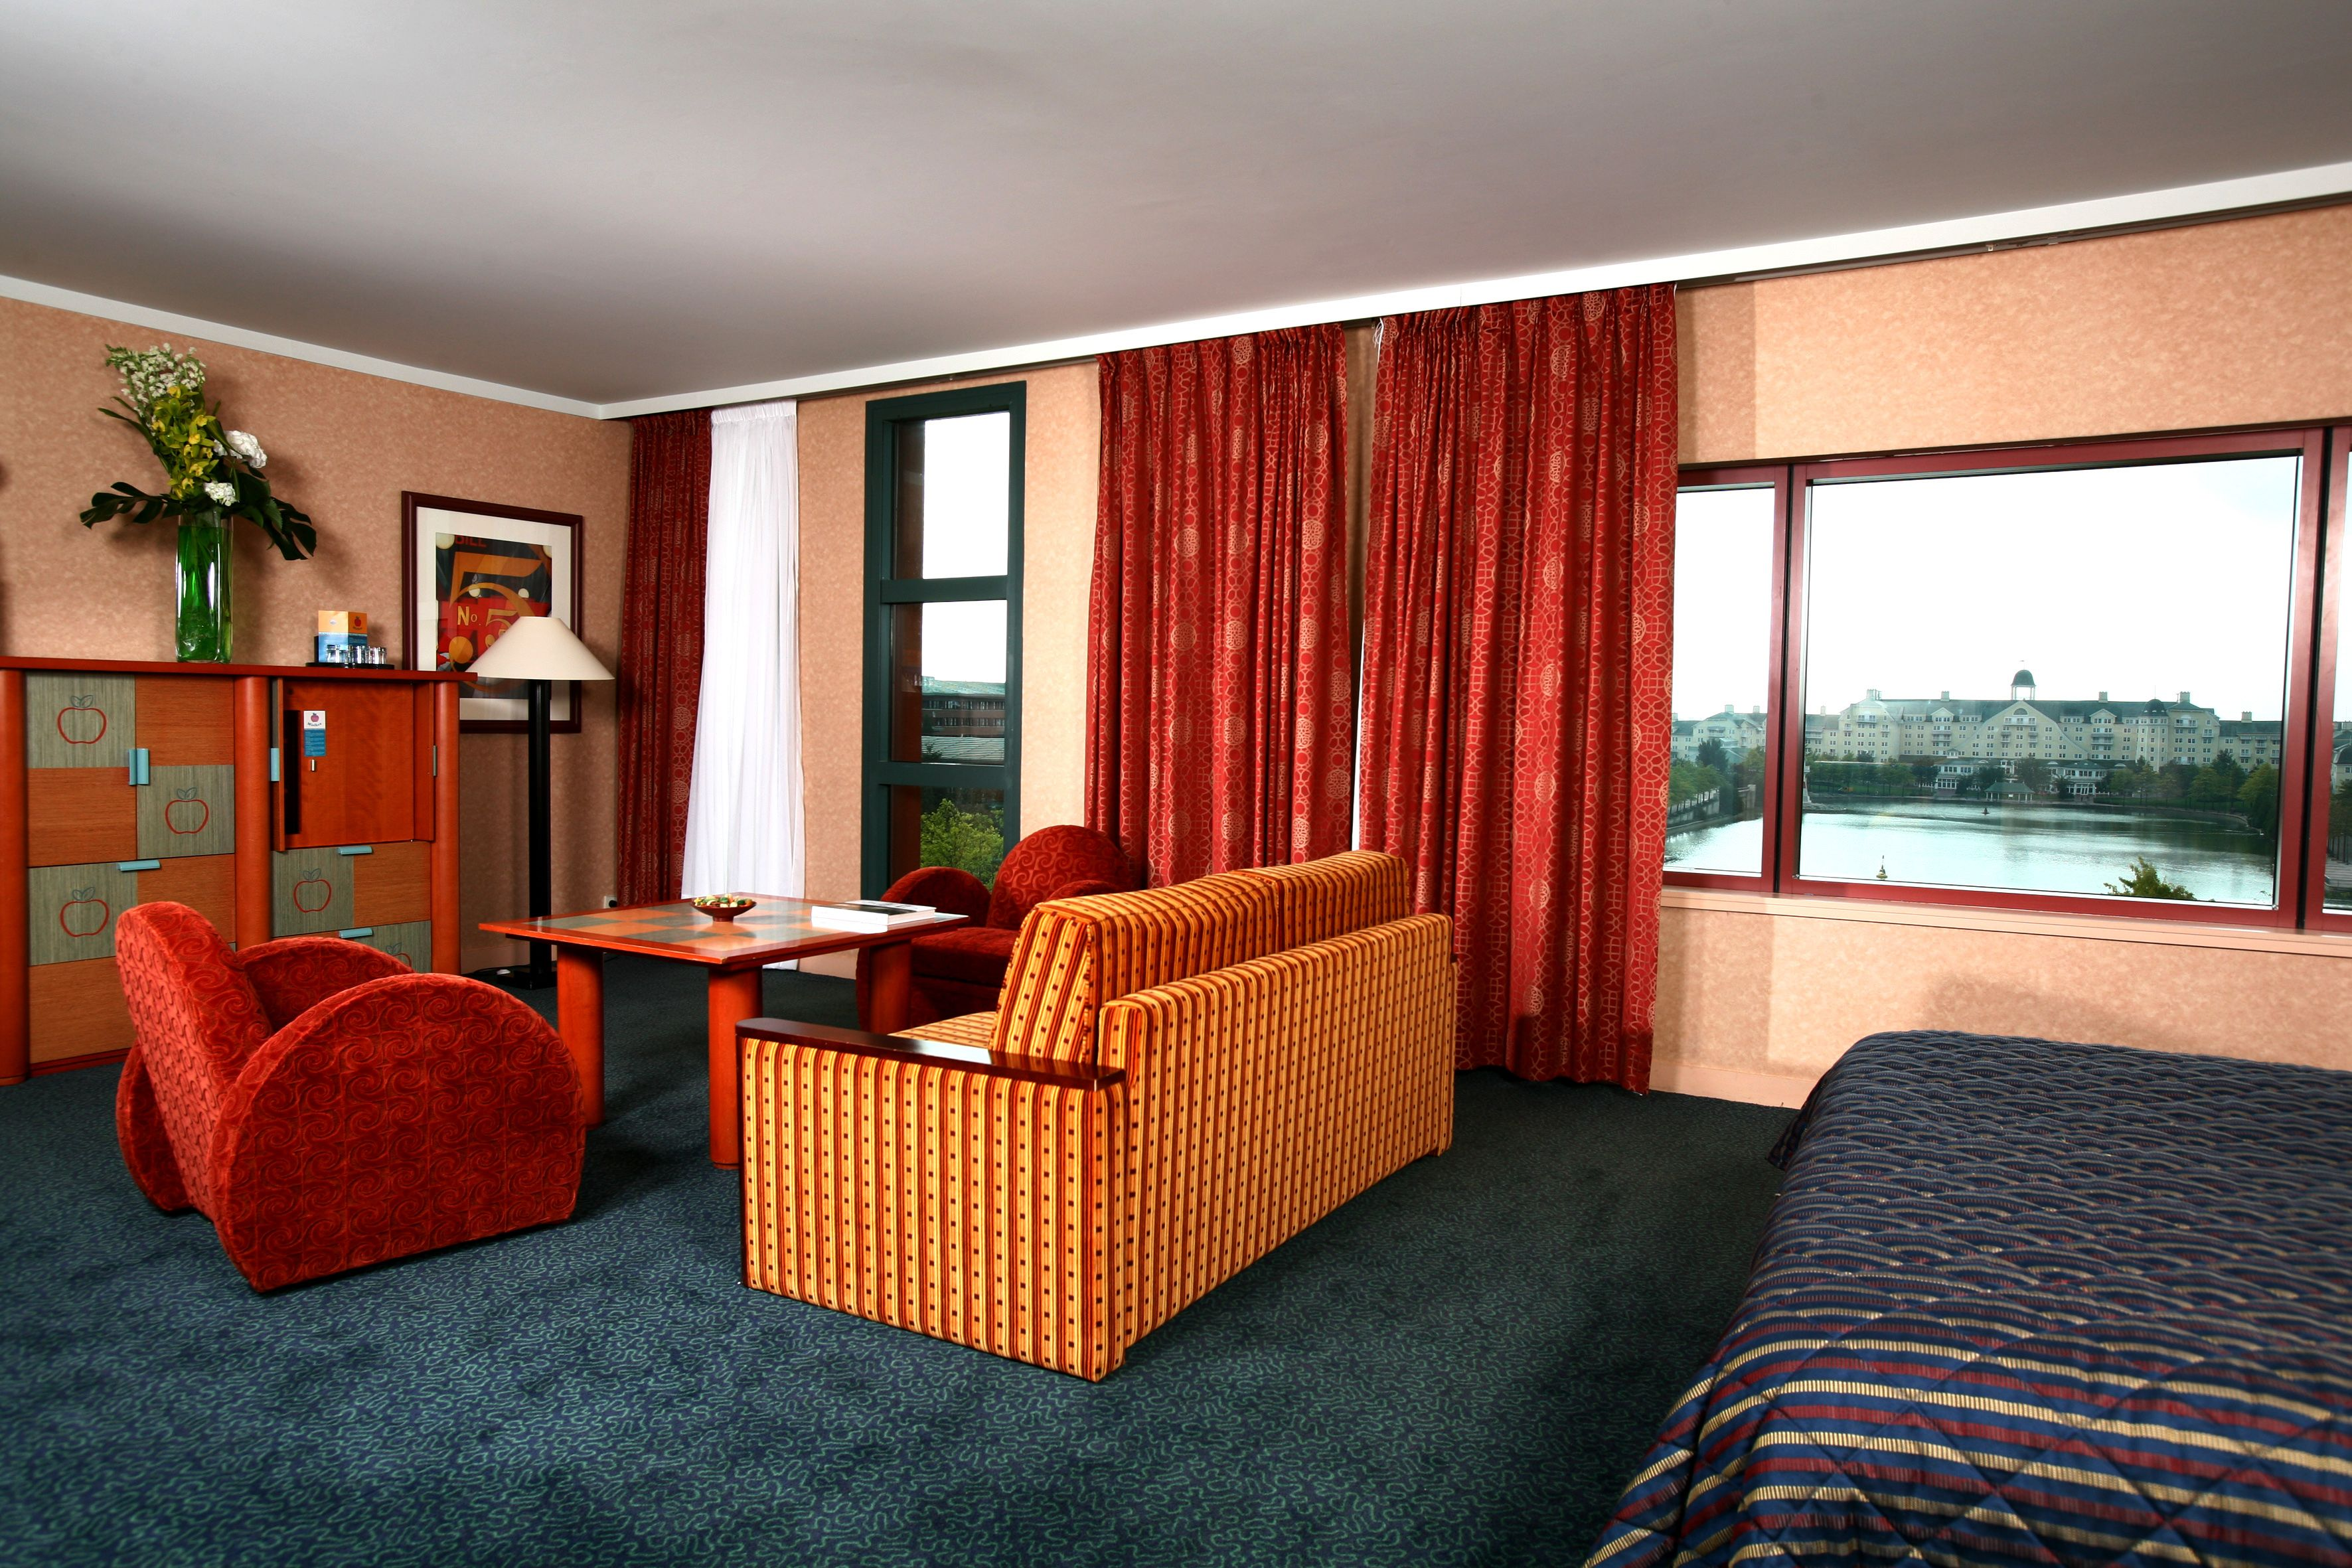 Disney Hotels Hotel New York Suite Disneyland Paris